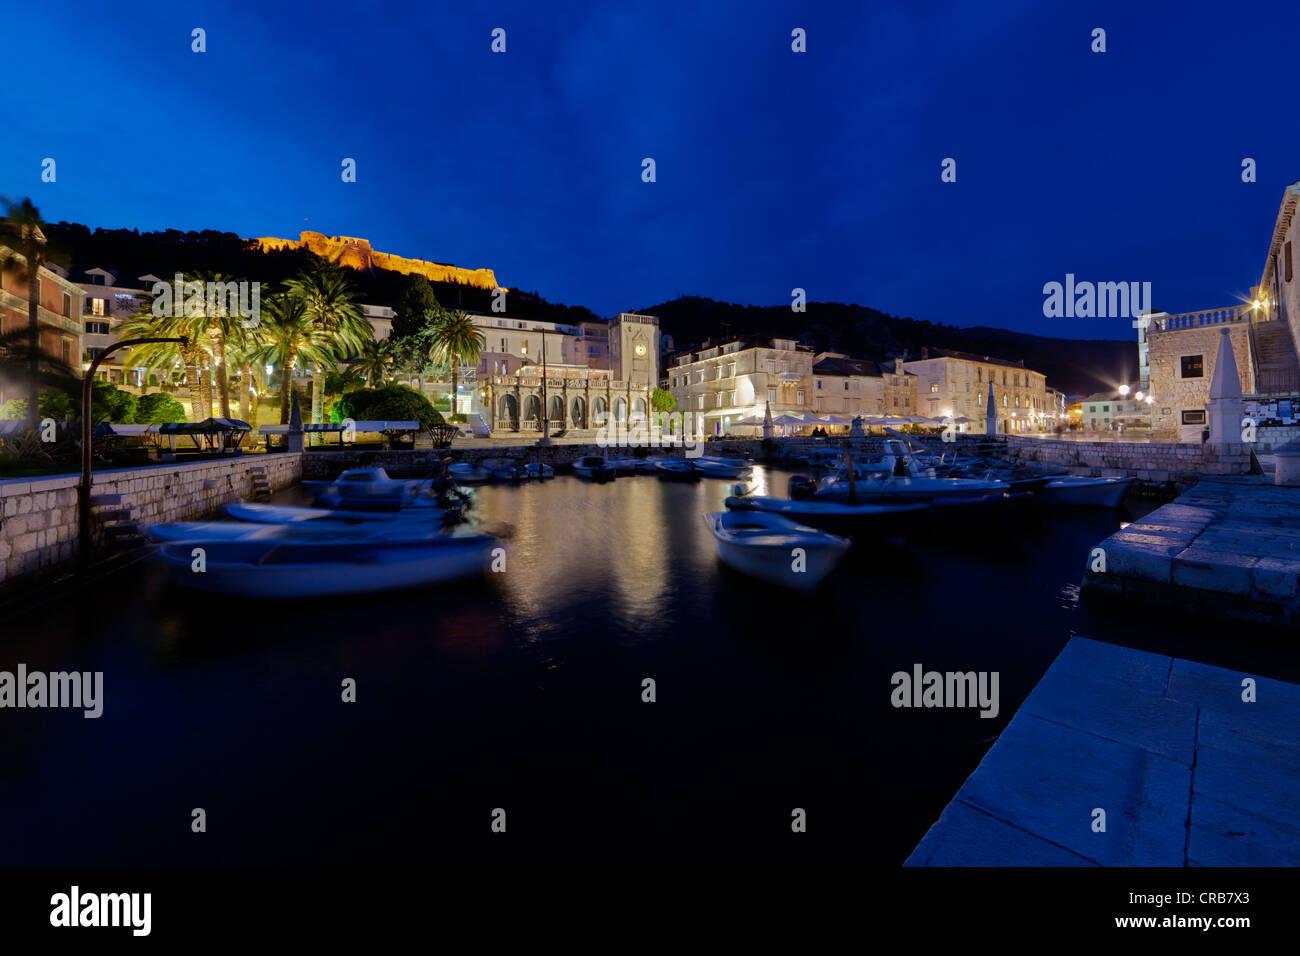 Harbour promenade at Trg Svetog Stjepana, St. Stephen's square, Hvar, Hvar Island, central Dalmatia, Dalmatia, - Stock Image